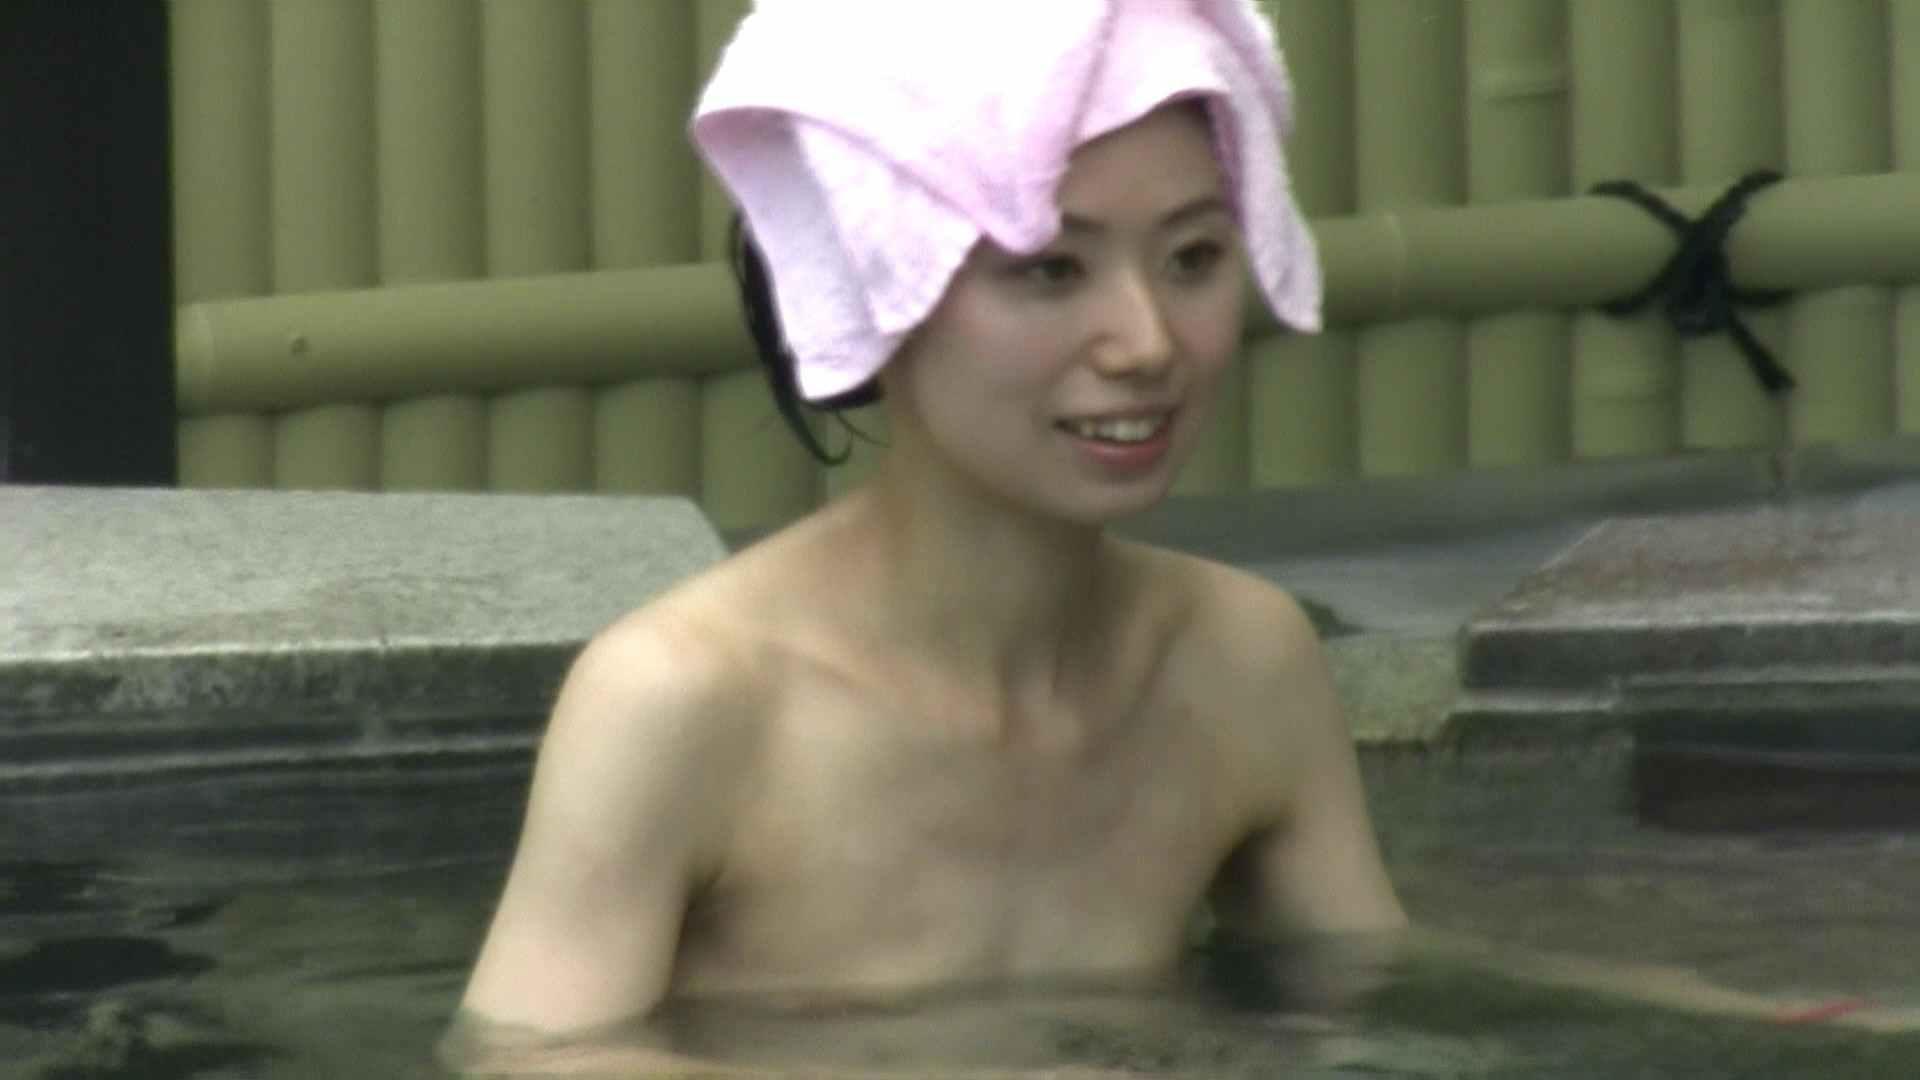 Aquaな露天風呂Vol.666 0  23連発 12